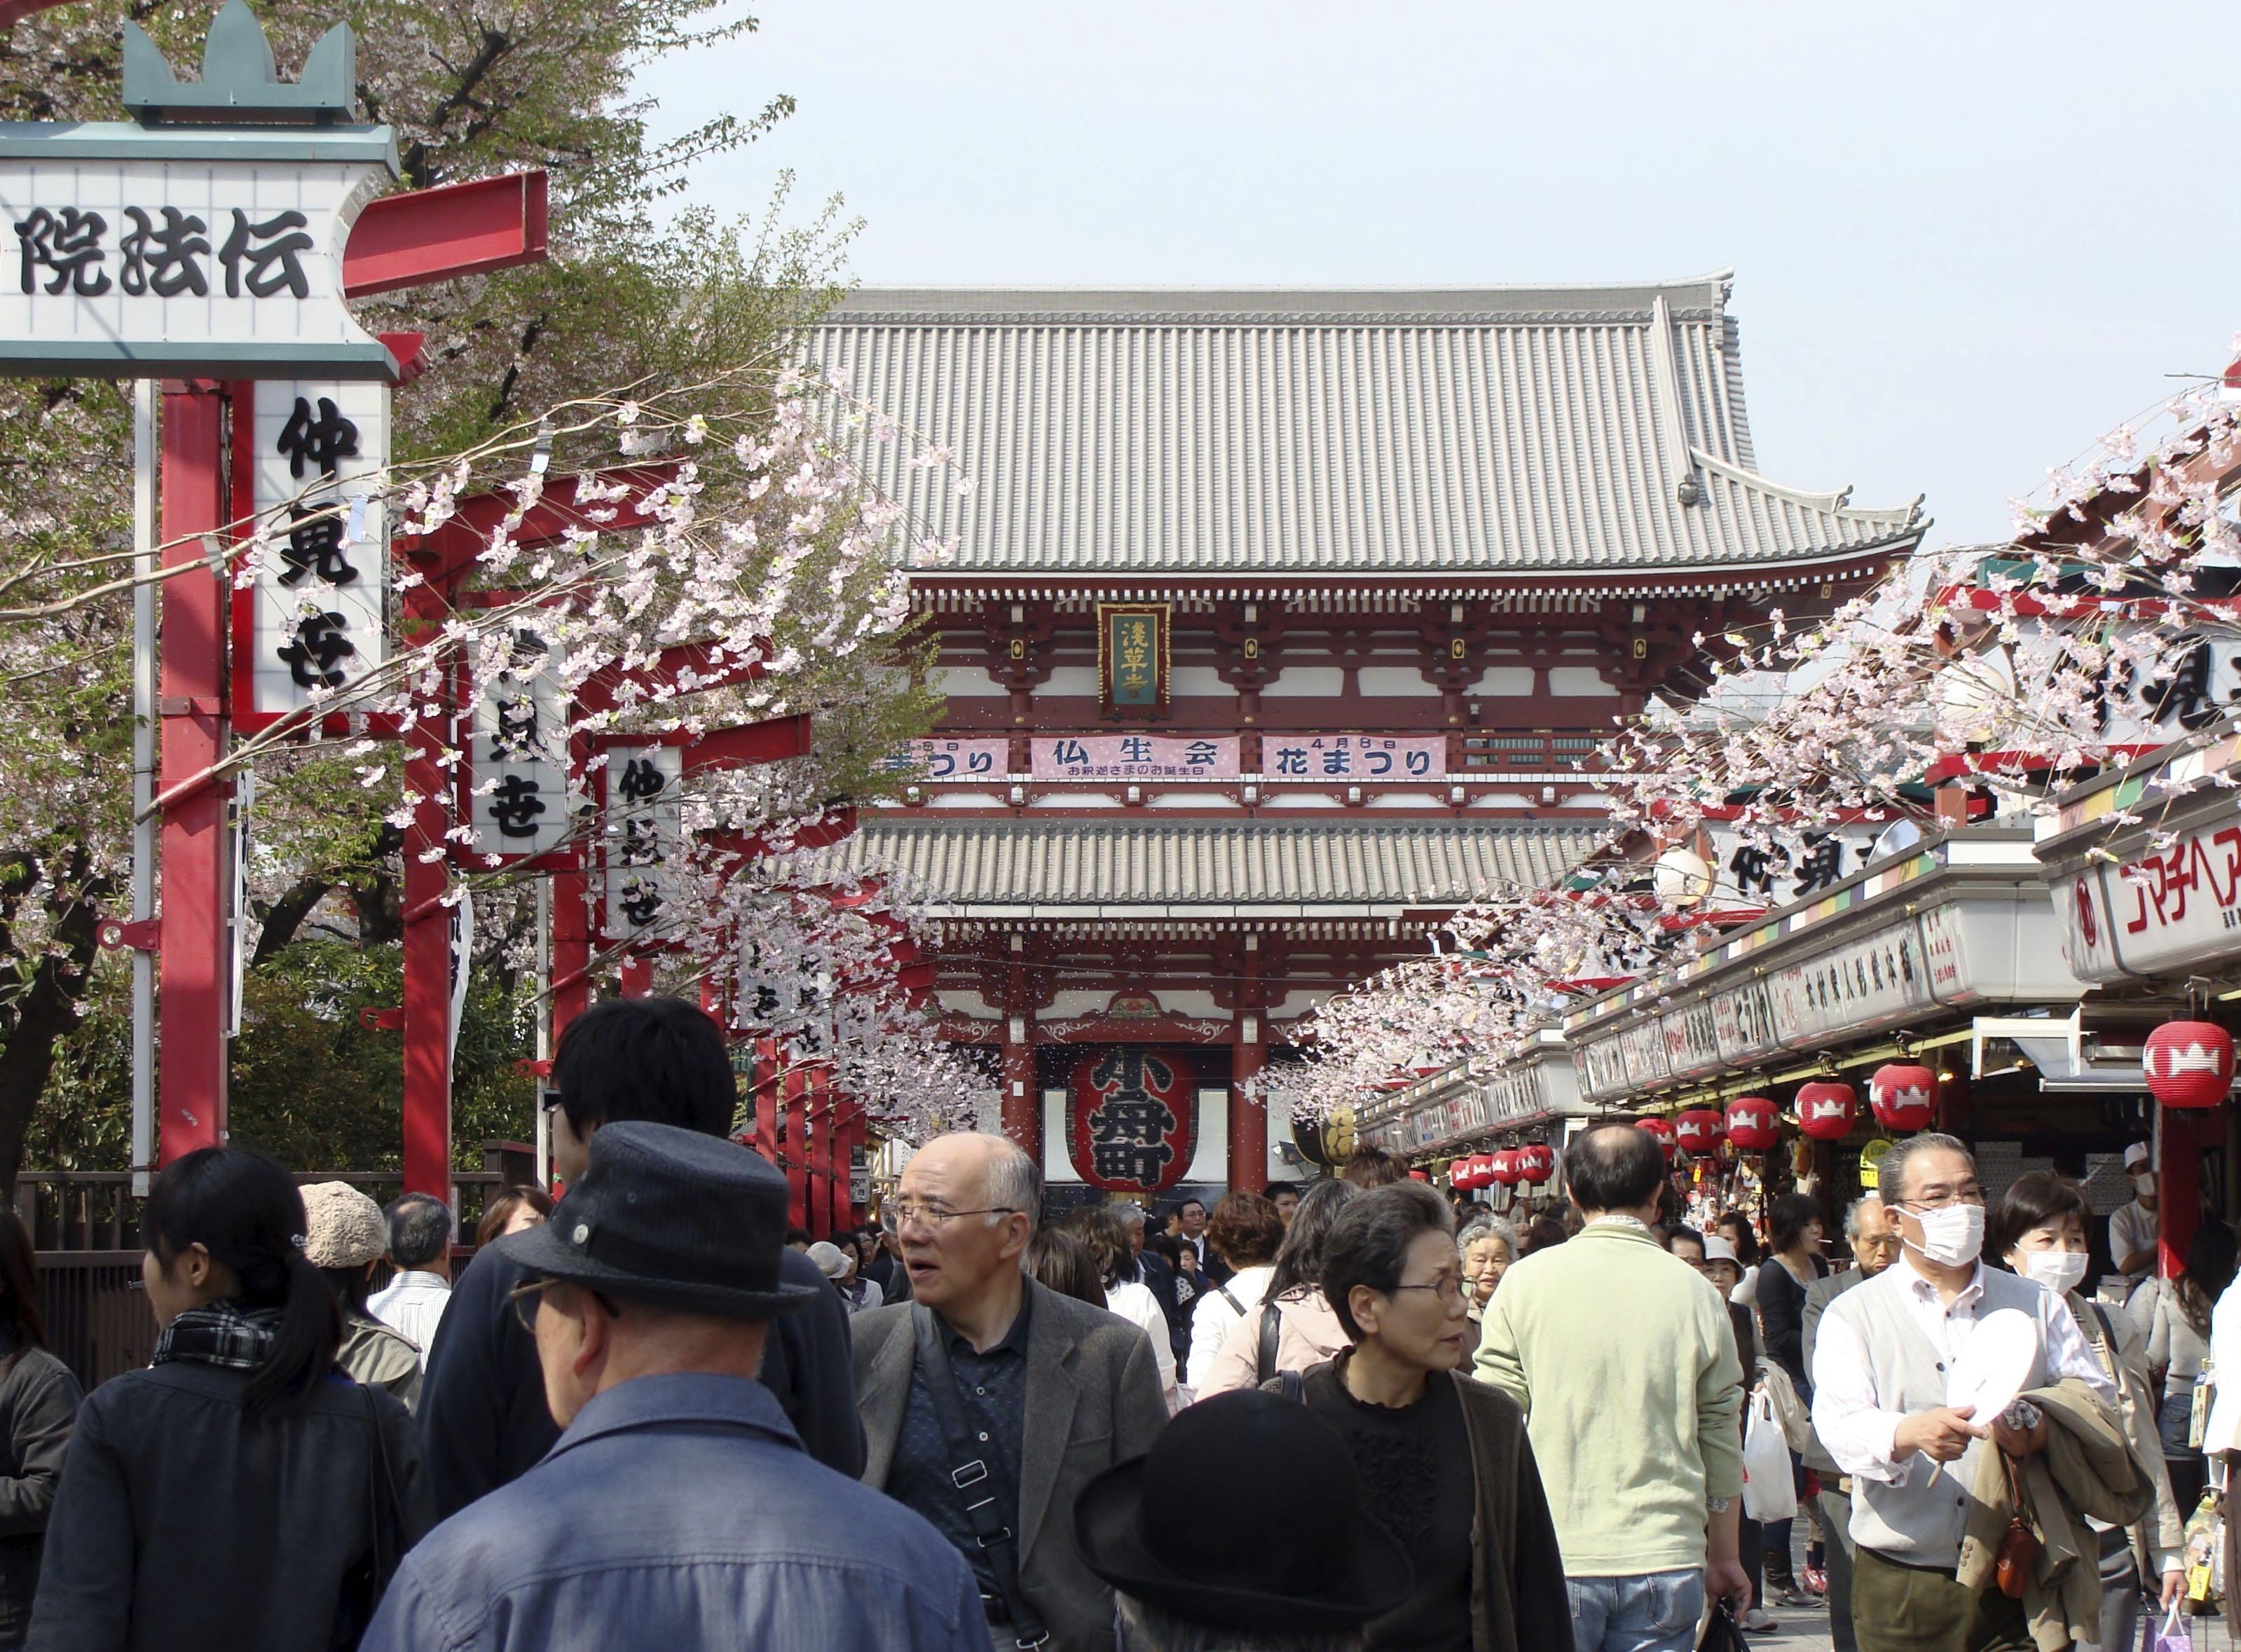 View of Senso-ji temple along Nakamise dori, Asakusa